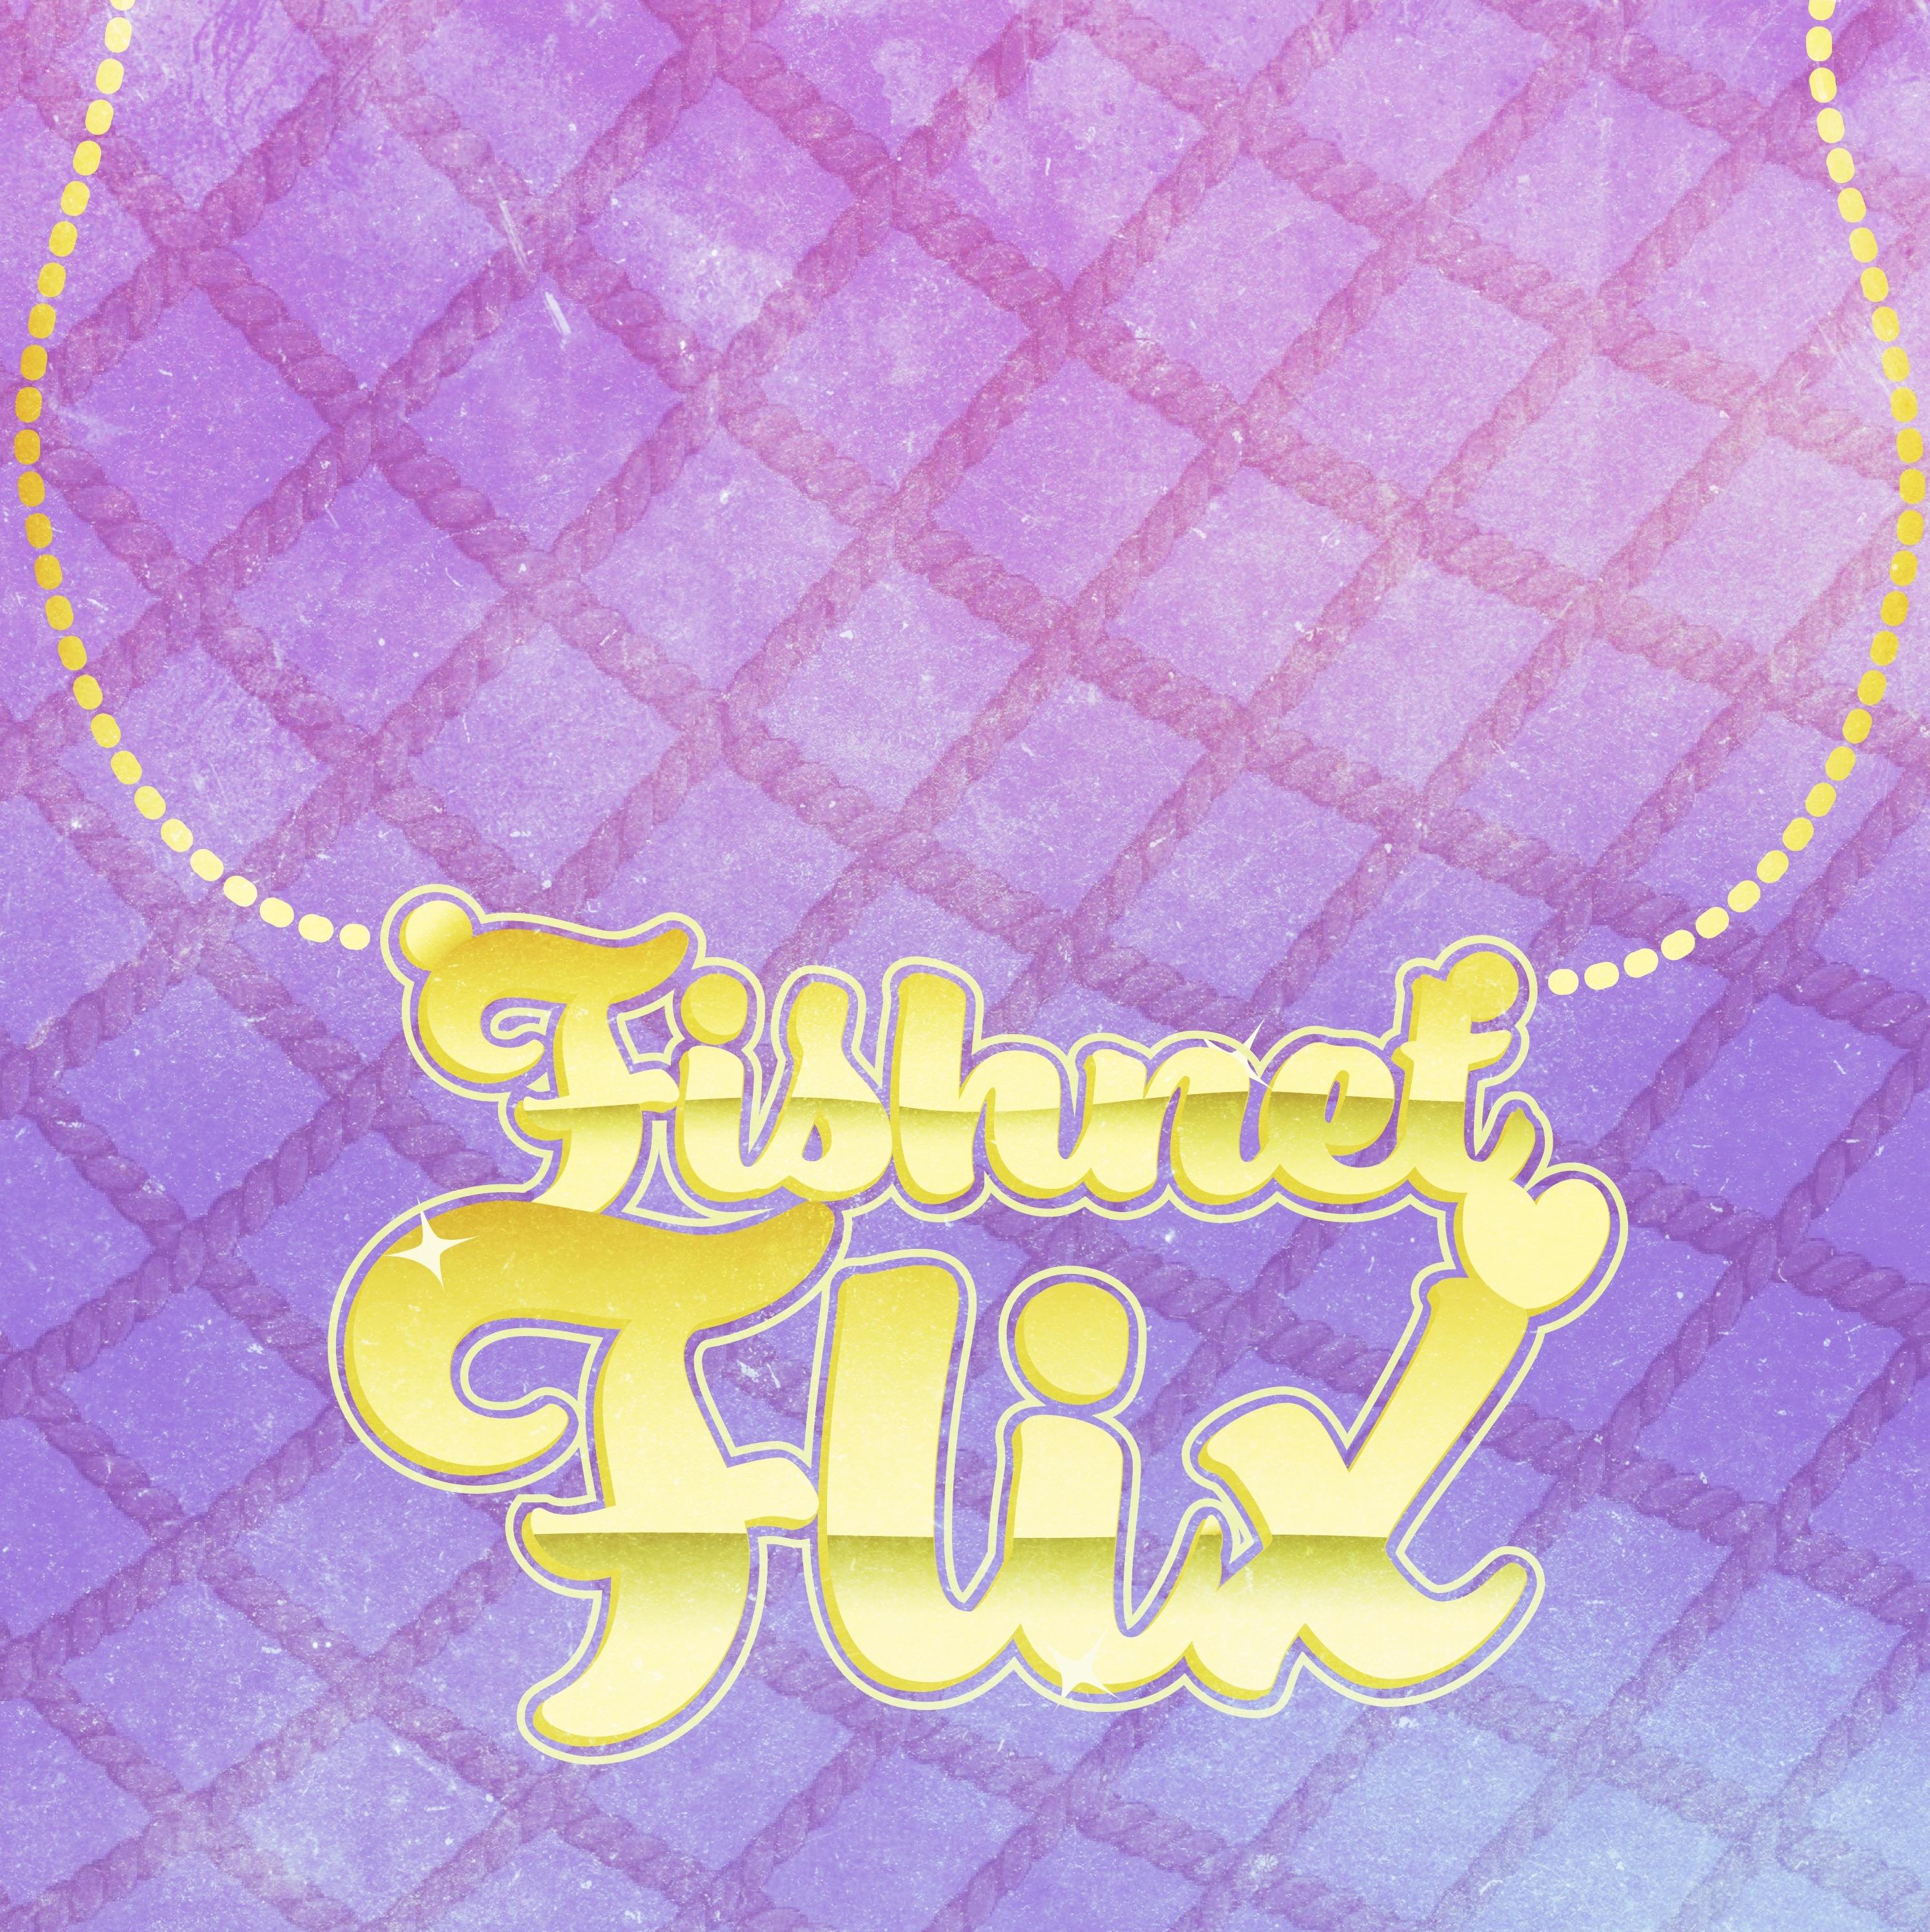 Fishnet Flix show art